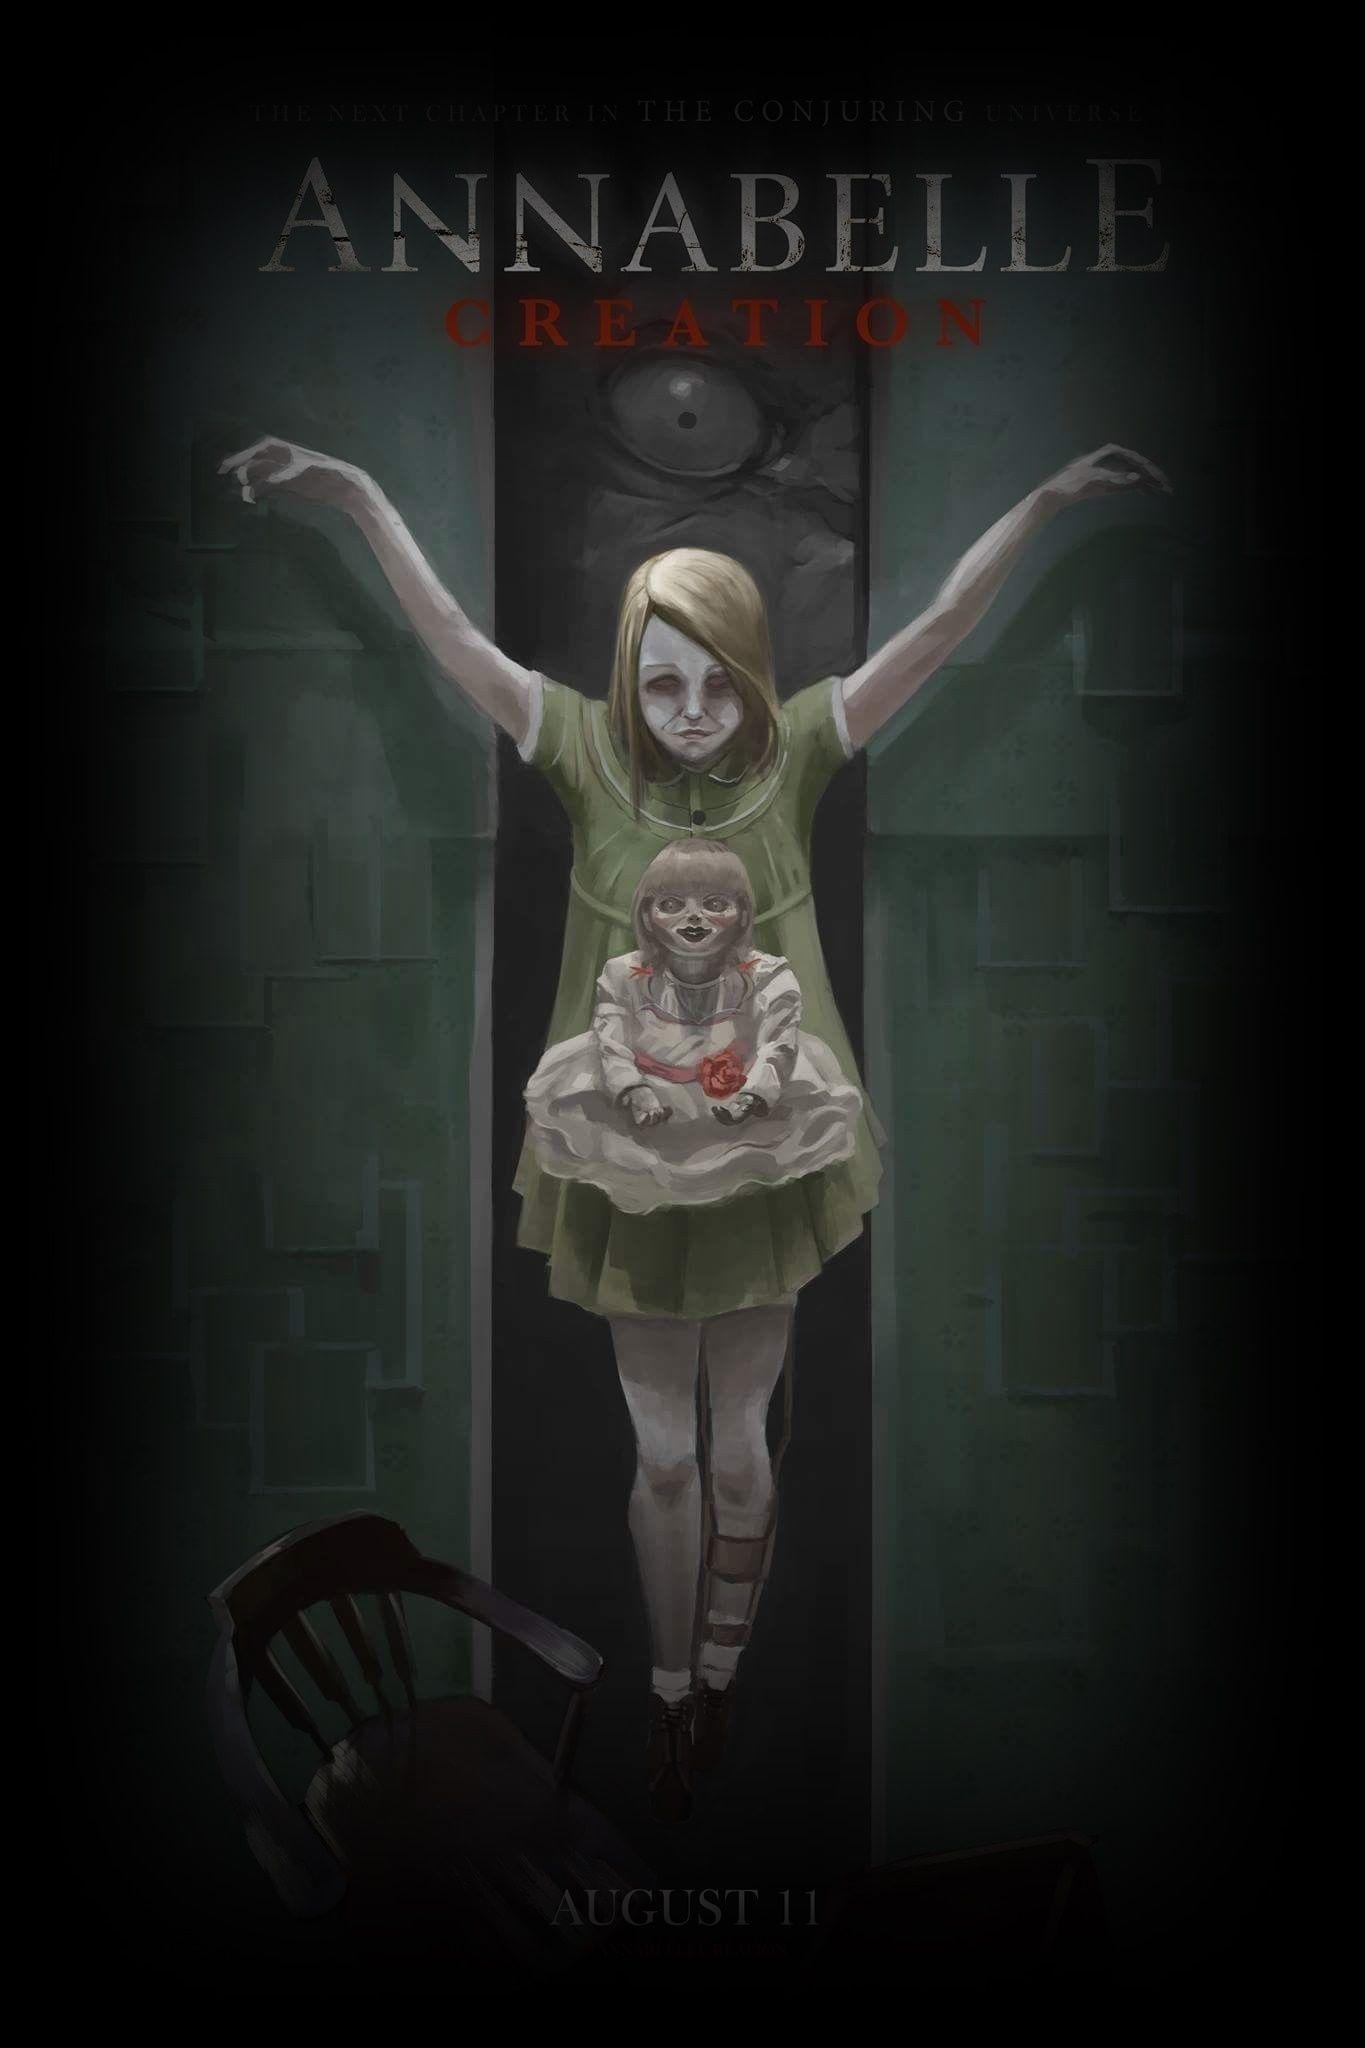 Film Magyarul Annabelle 3 2 0 1 9 Teljes Film Online Hd Horror Movie Fan Horror Movie Posters The Conjuring Annabelle